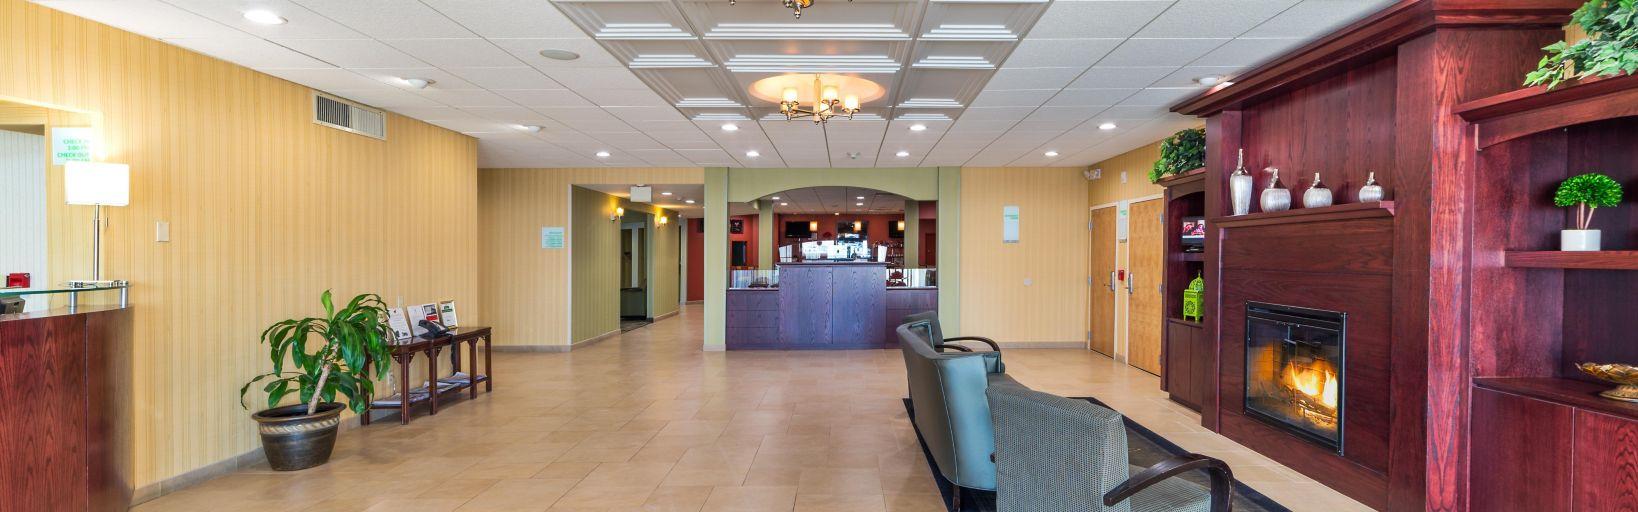 Plattsburgh Airport Hotel Exterior Lobby